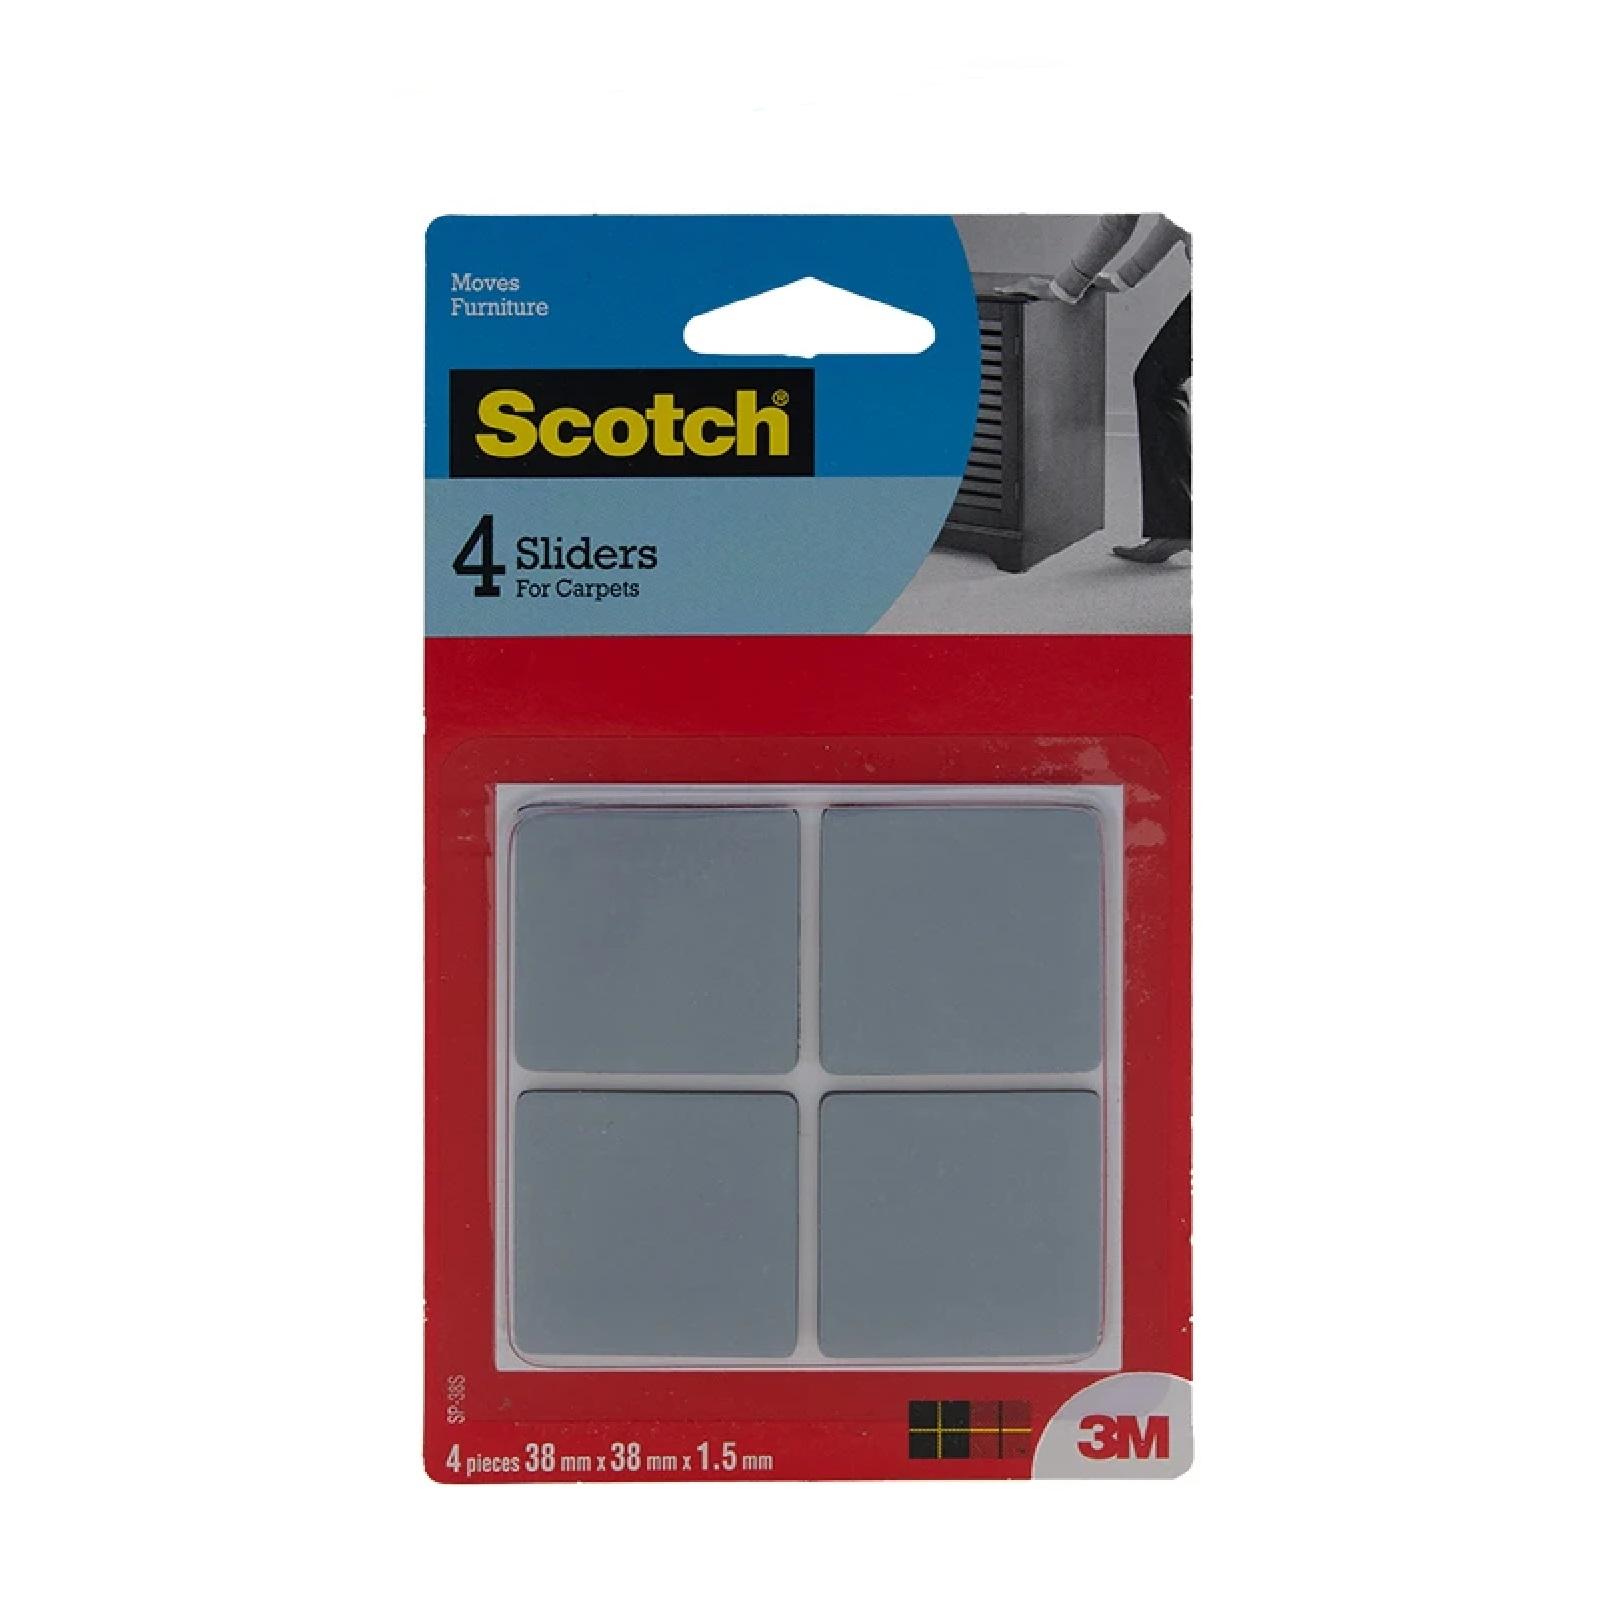 3M Scotch Slider Square 38MM X 38MM 4PC/Pack